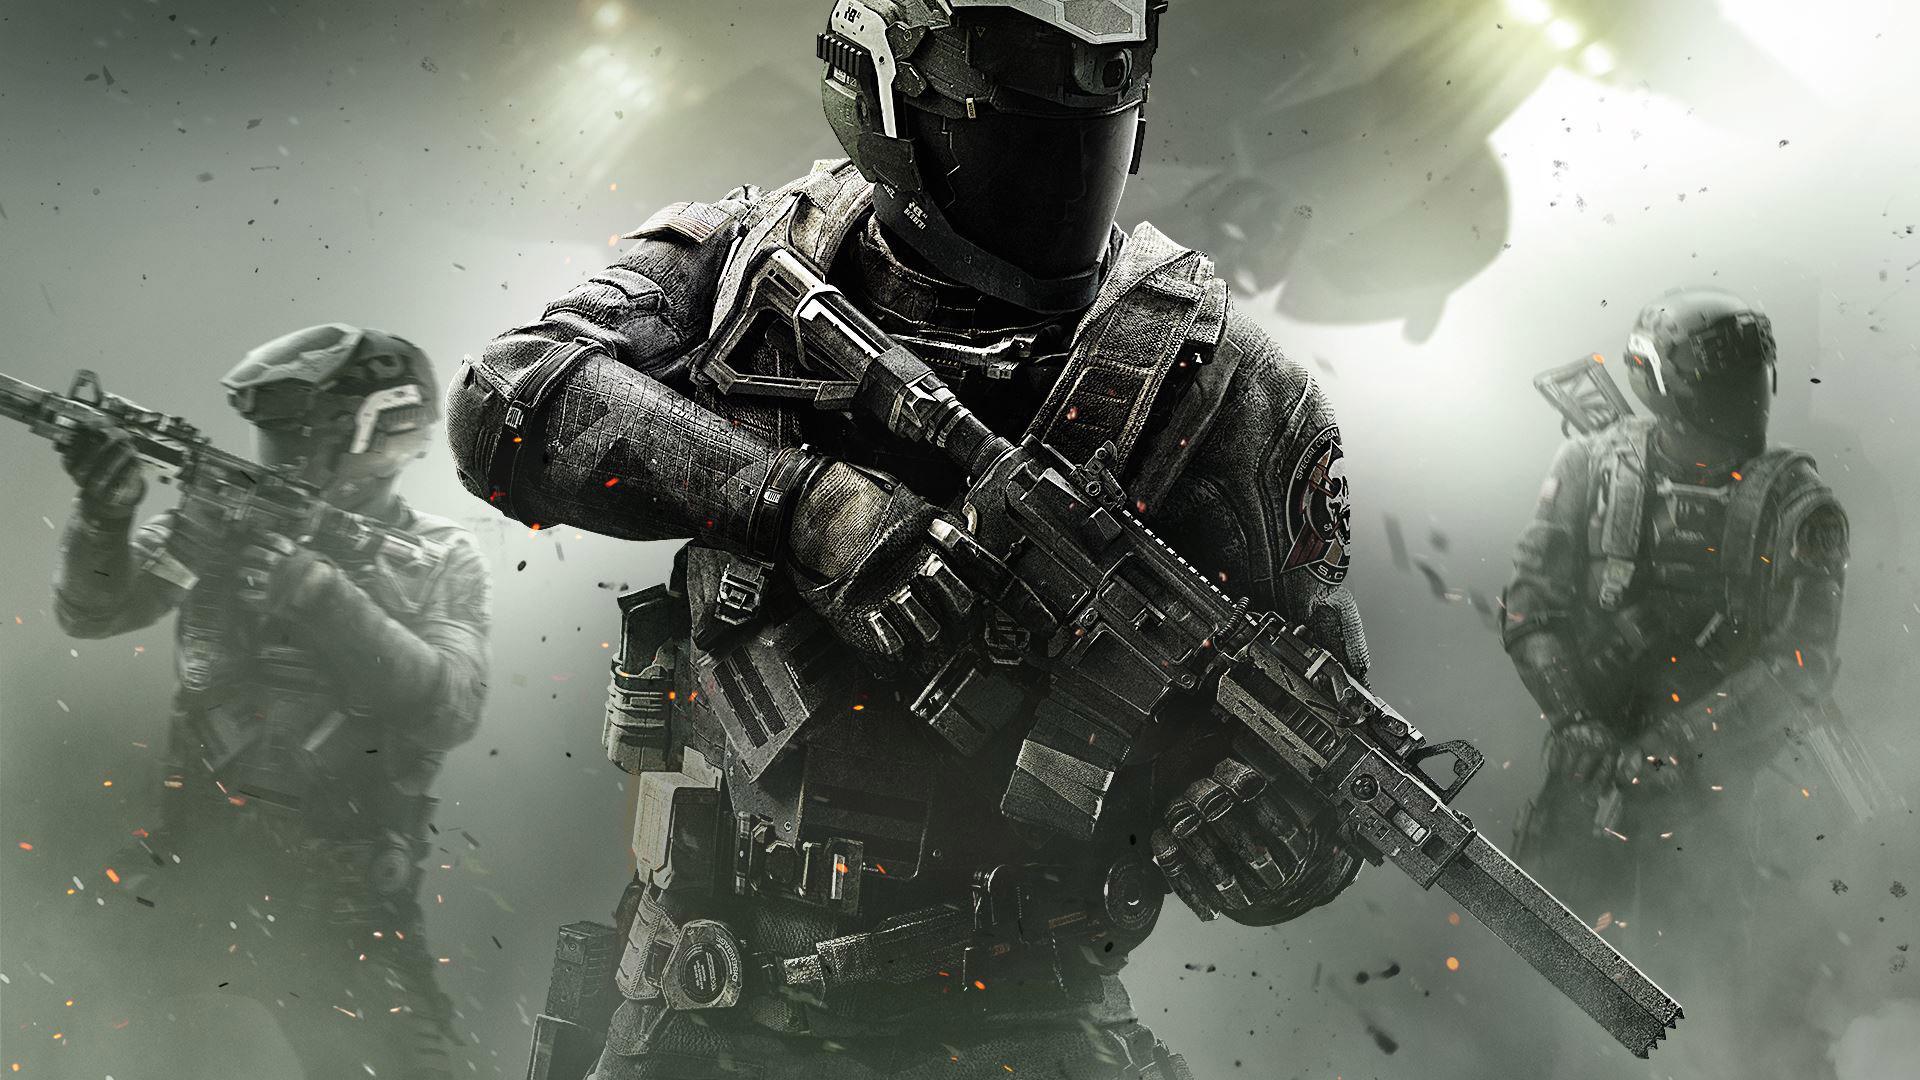 Call of Duty: Infinite Warfare Wallpaper in 1920x1080